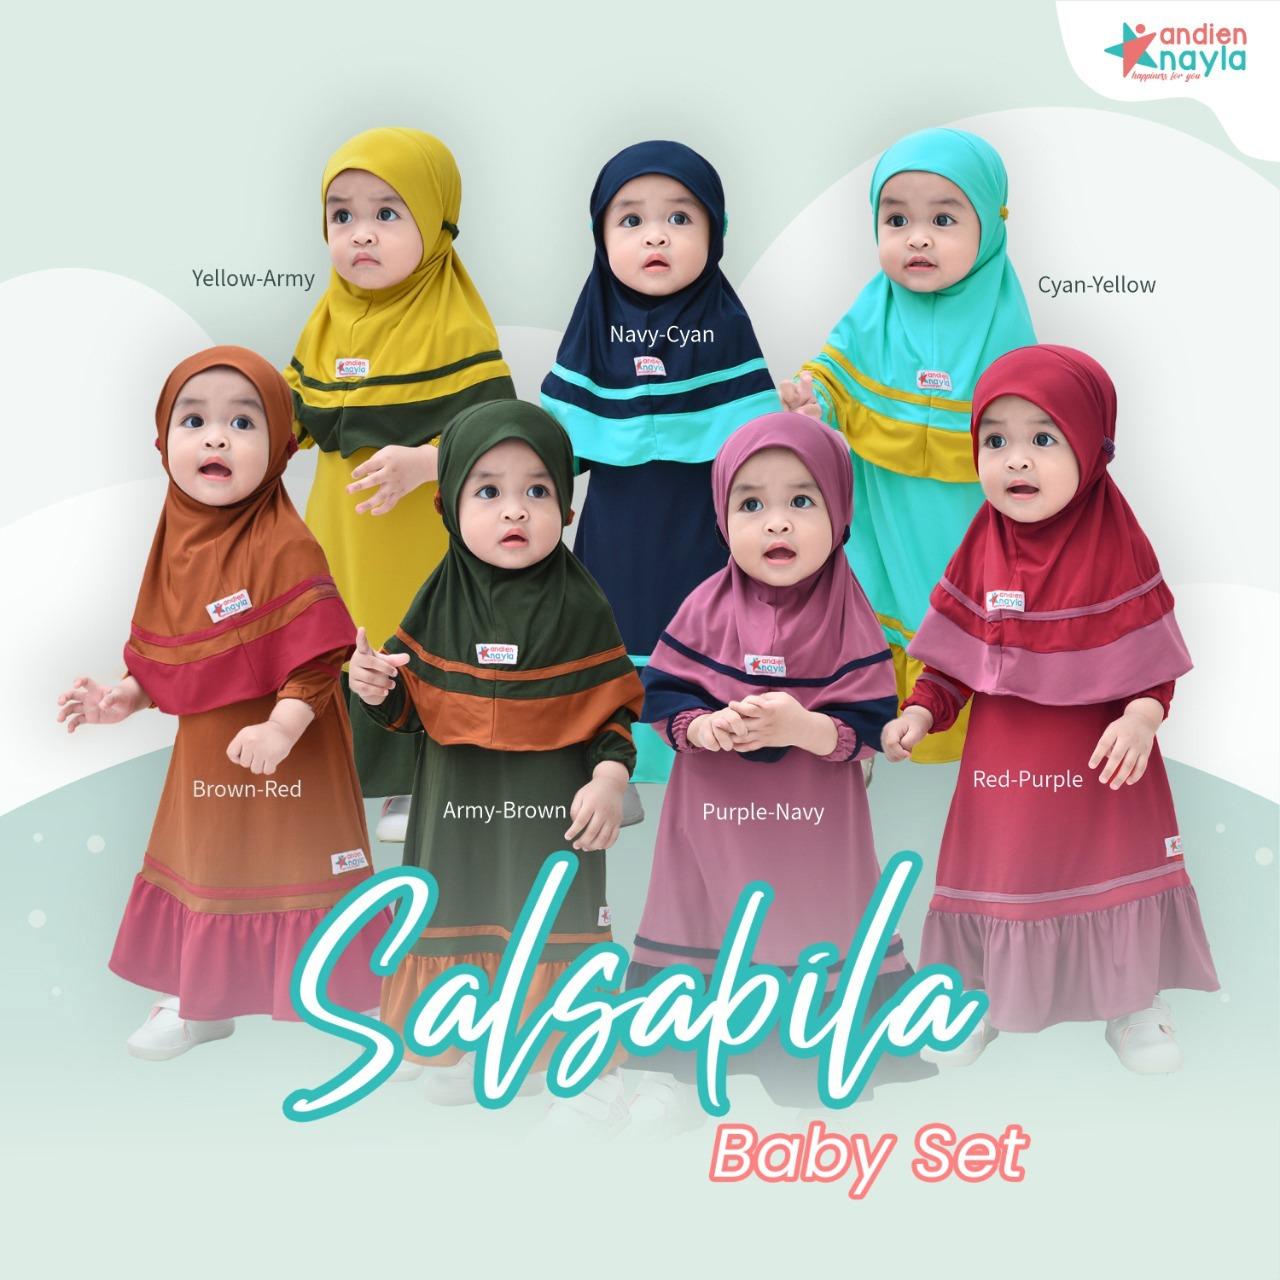 Salsabila Baby Set